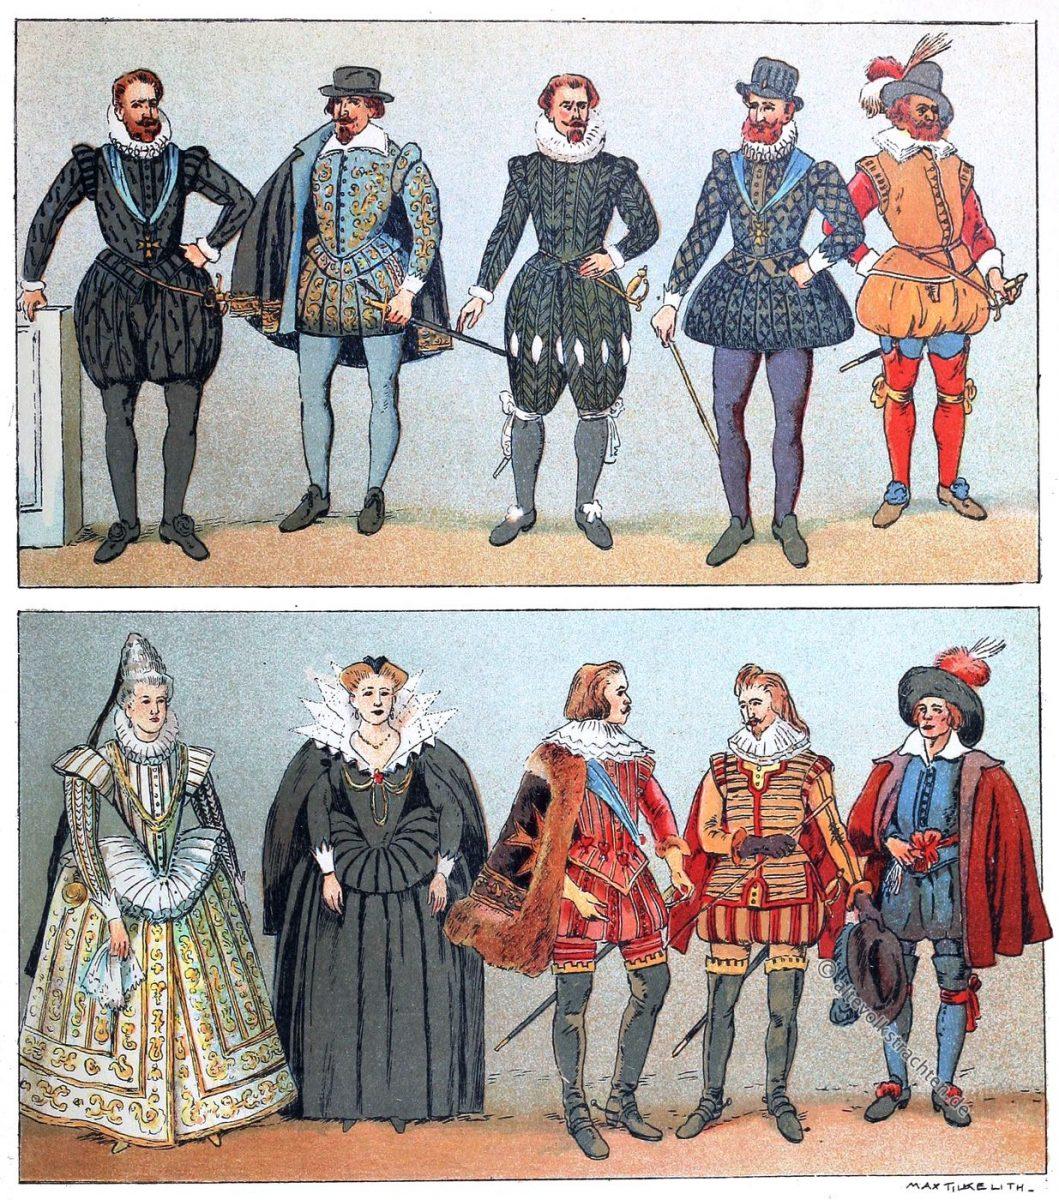 Barock, Mode, Frankreich, 1590, 17. Jahrhundert, Kostümgeschichte, Adolf Rosenberg, Eduard Heyck